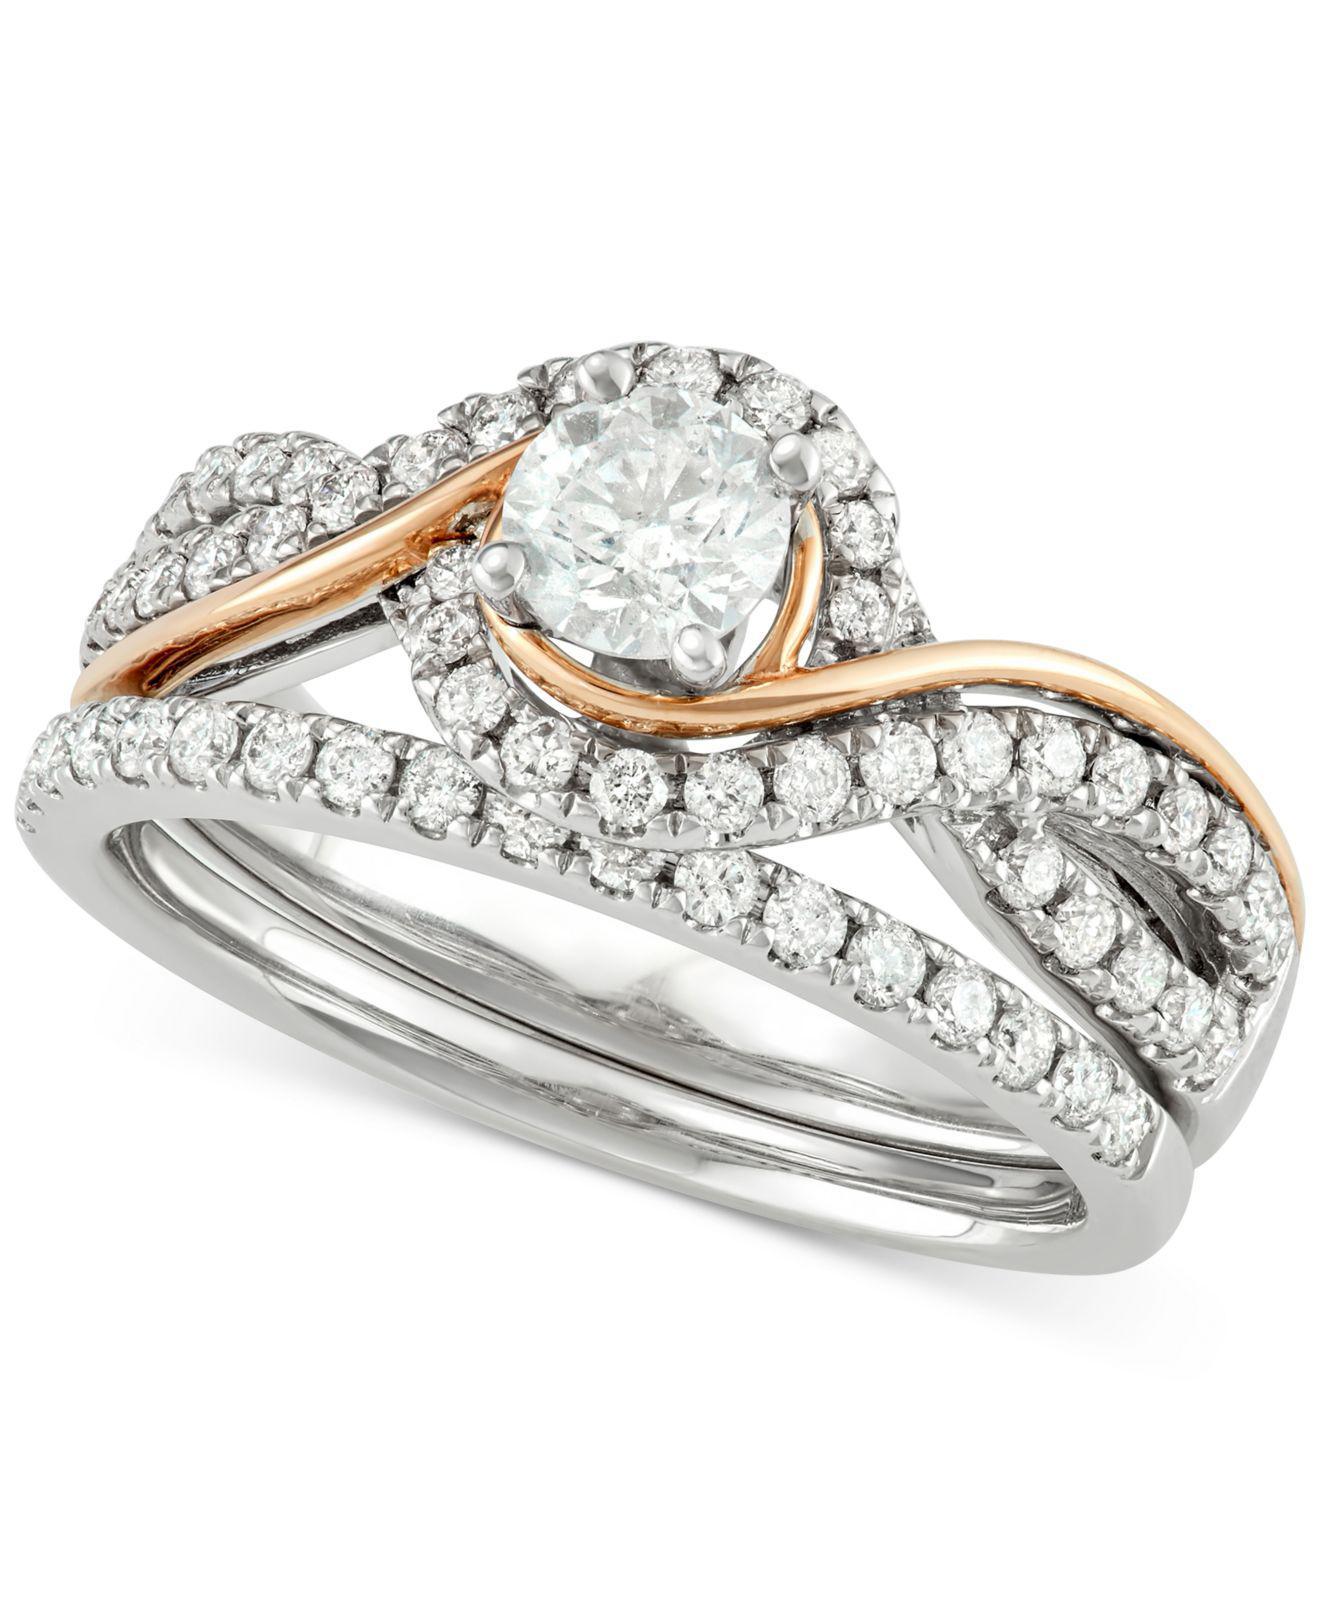 Macy s Diamond Two tone Overlap Bridal Set 7 8 Ct T w In 14k